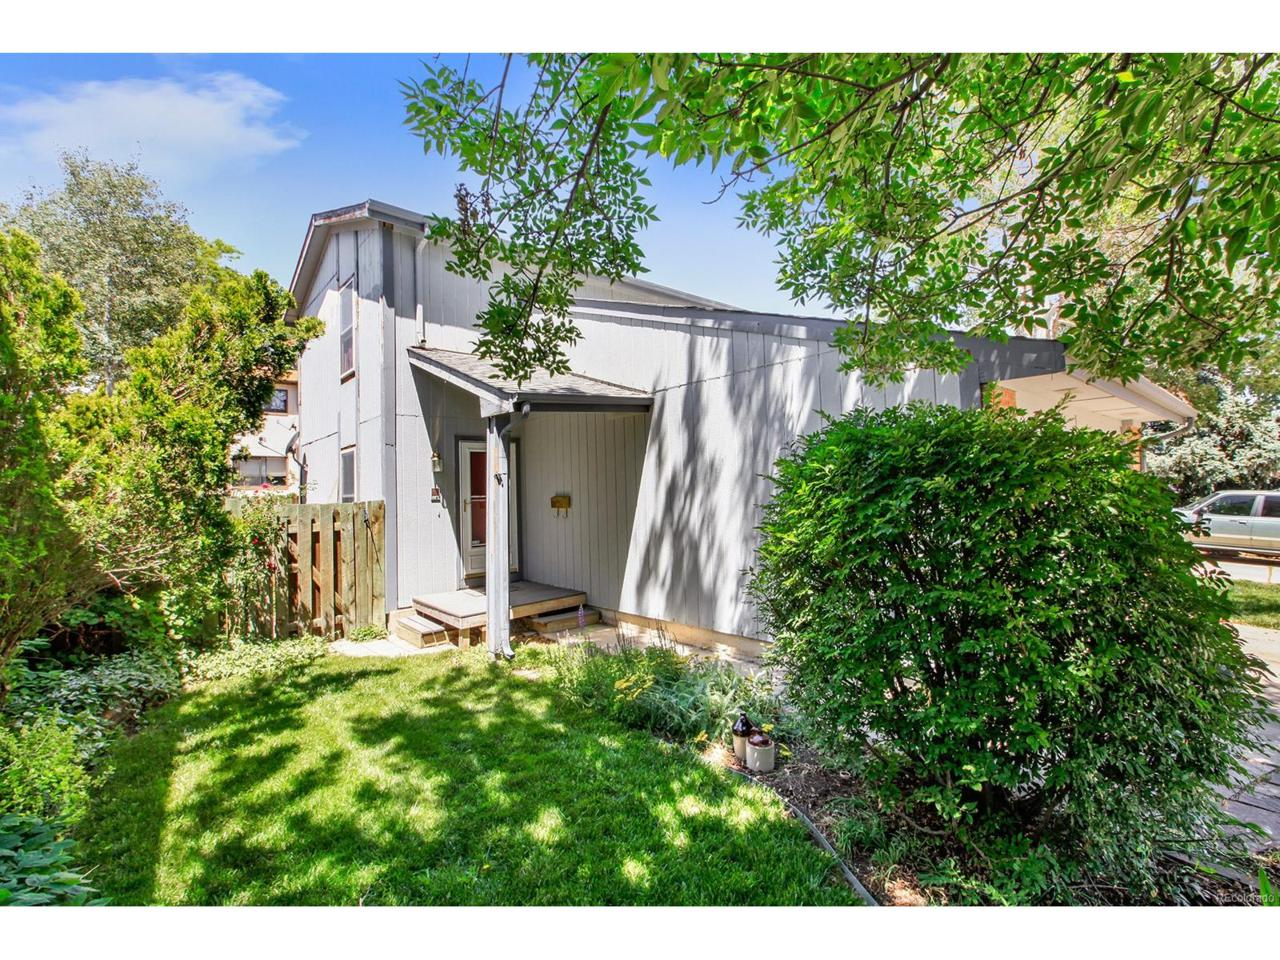 11719 Grant Street, Northglenn, CO 80233 (MLS #7231351) :: 8z Real Estate